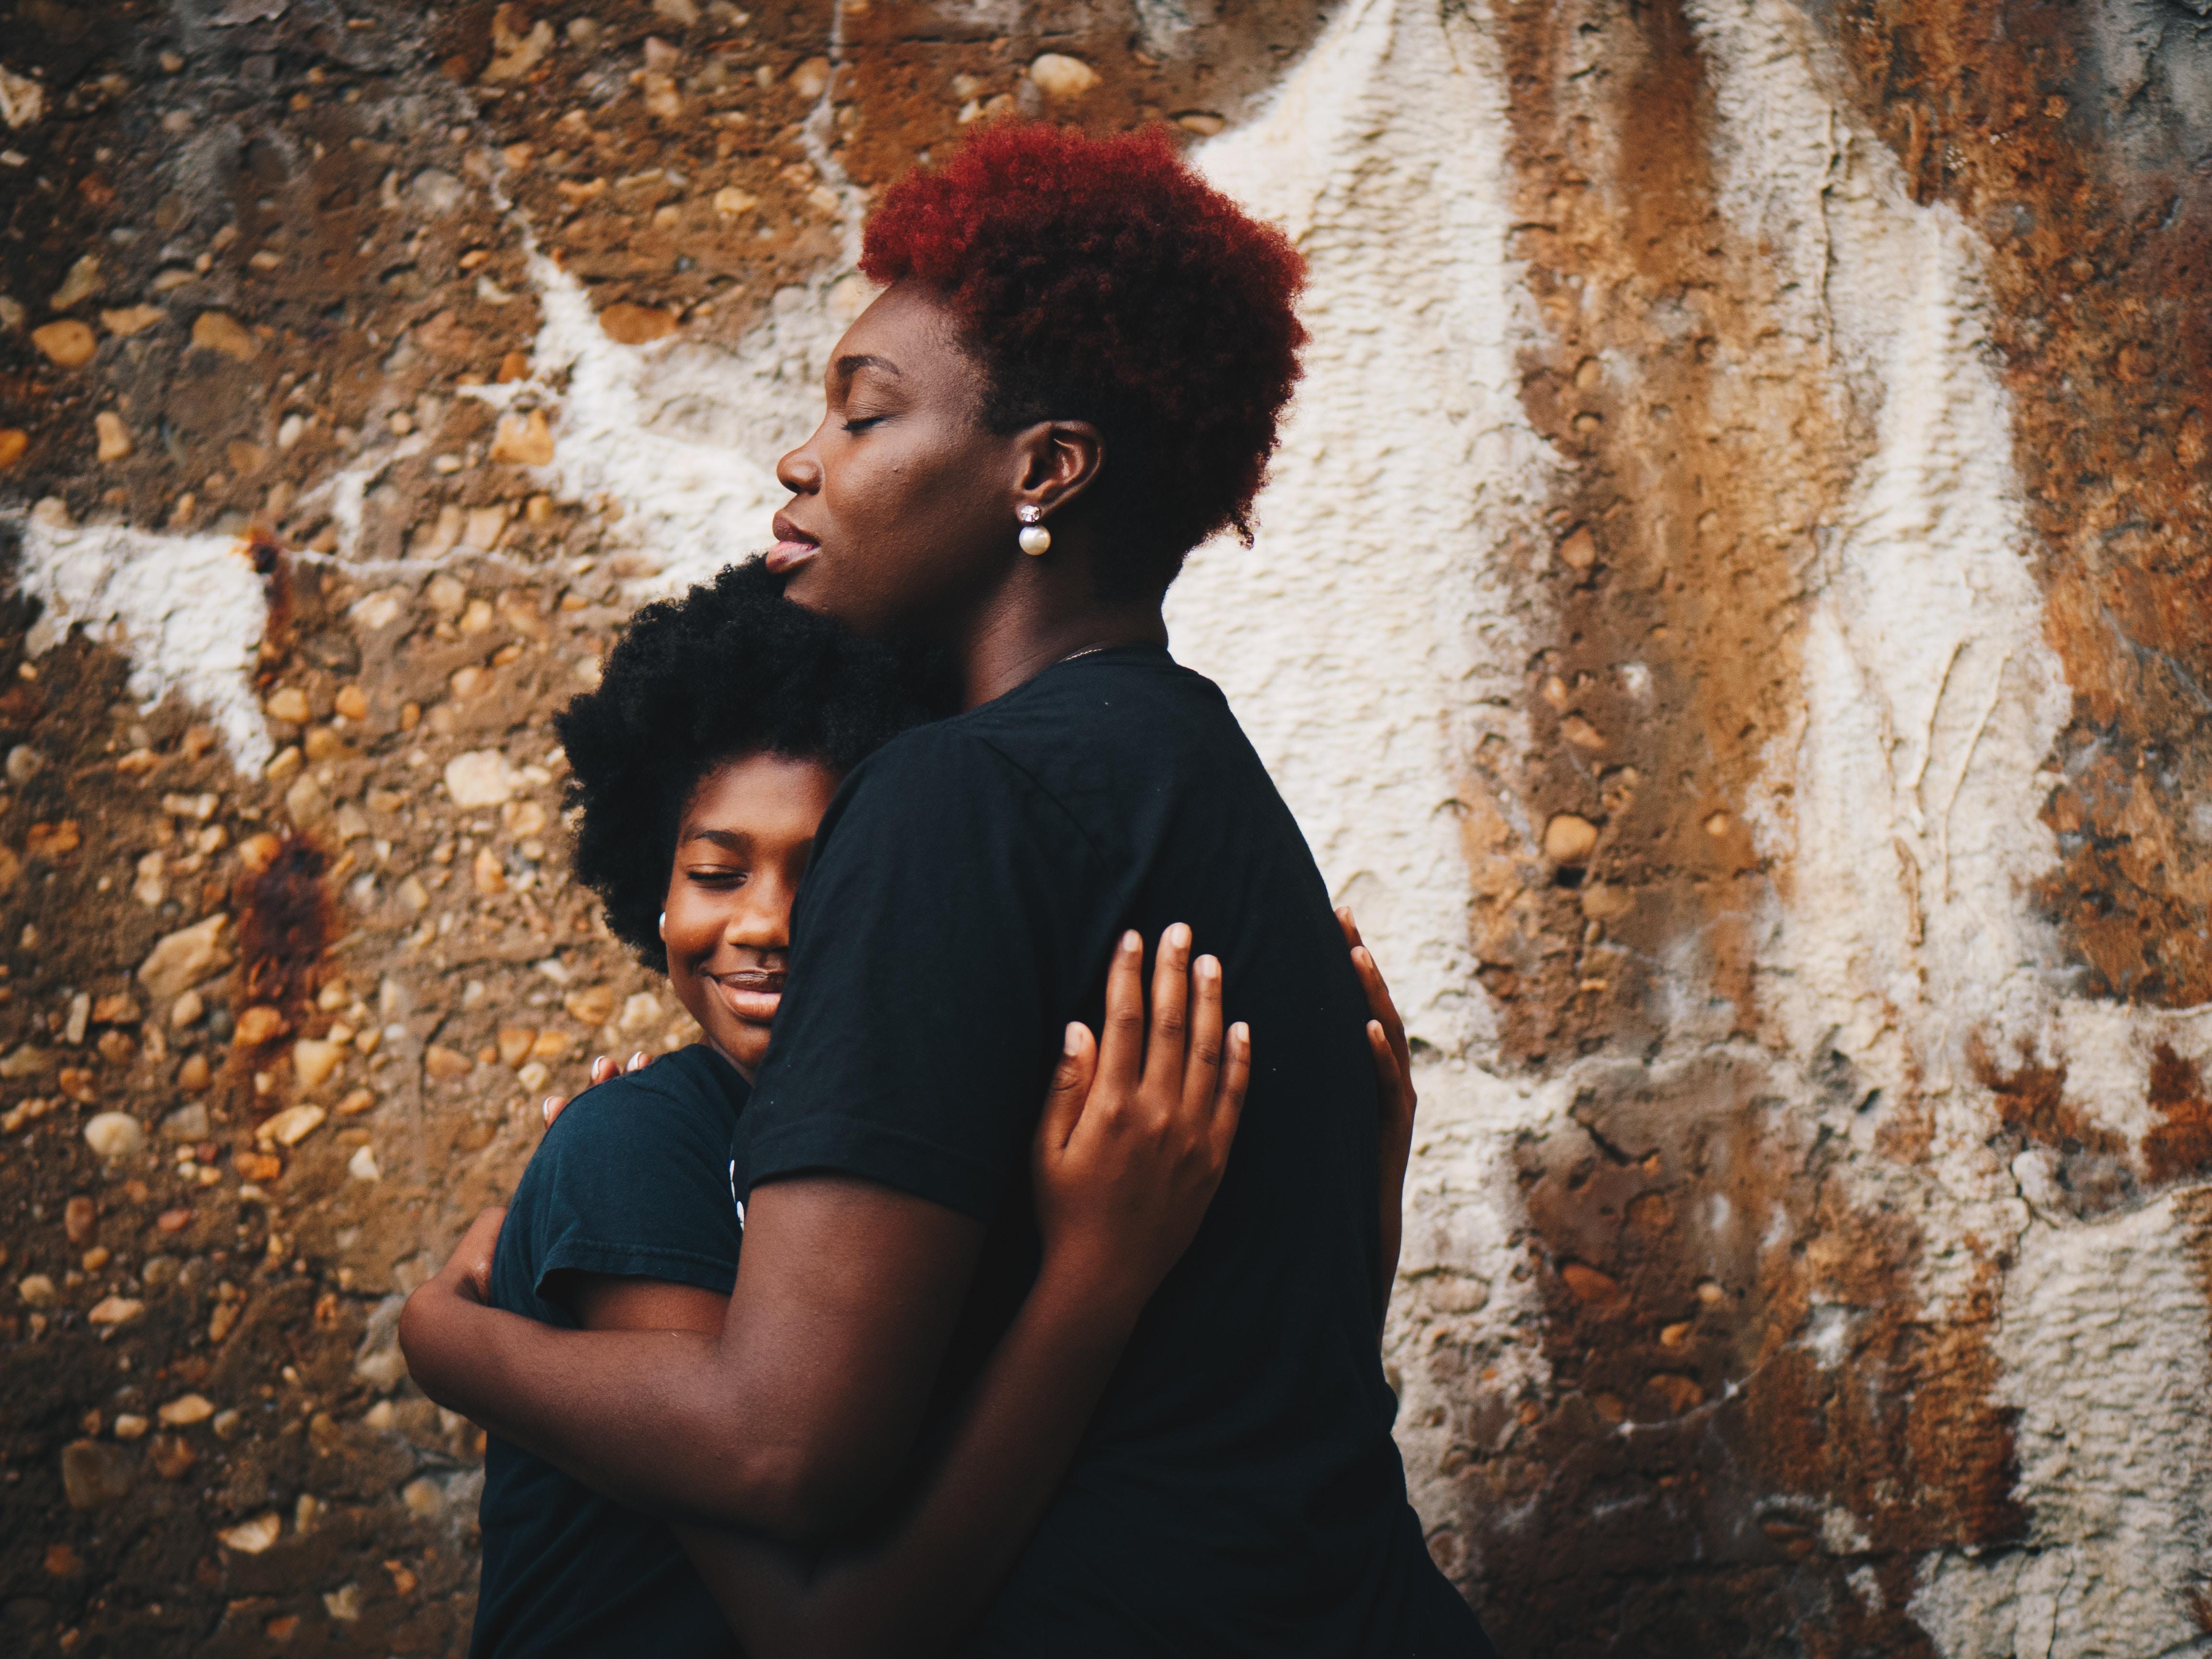 Two women in black shirts hugging